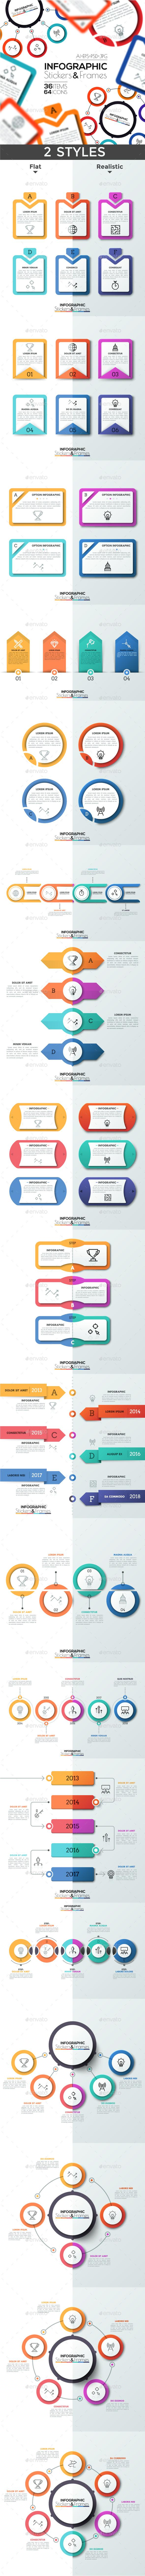 Infographic Slides & Frames - Infographics